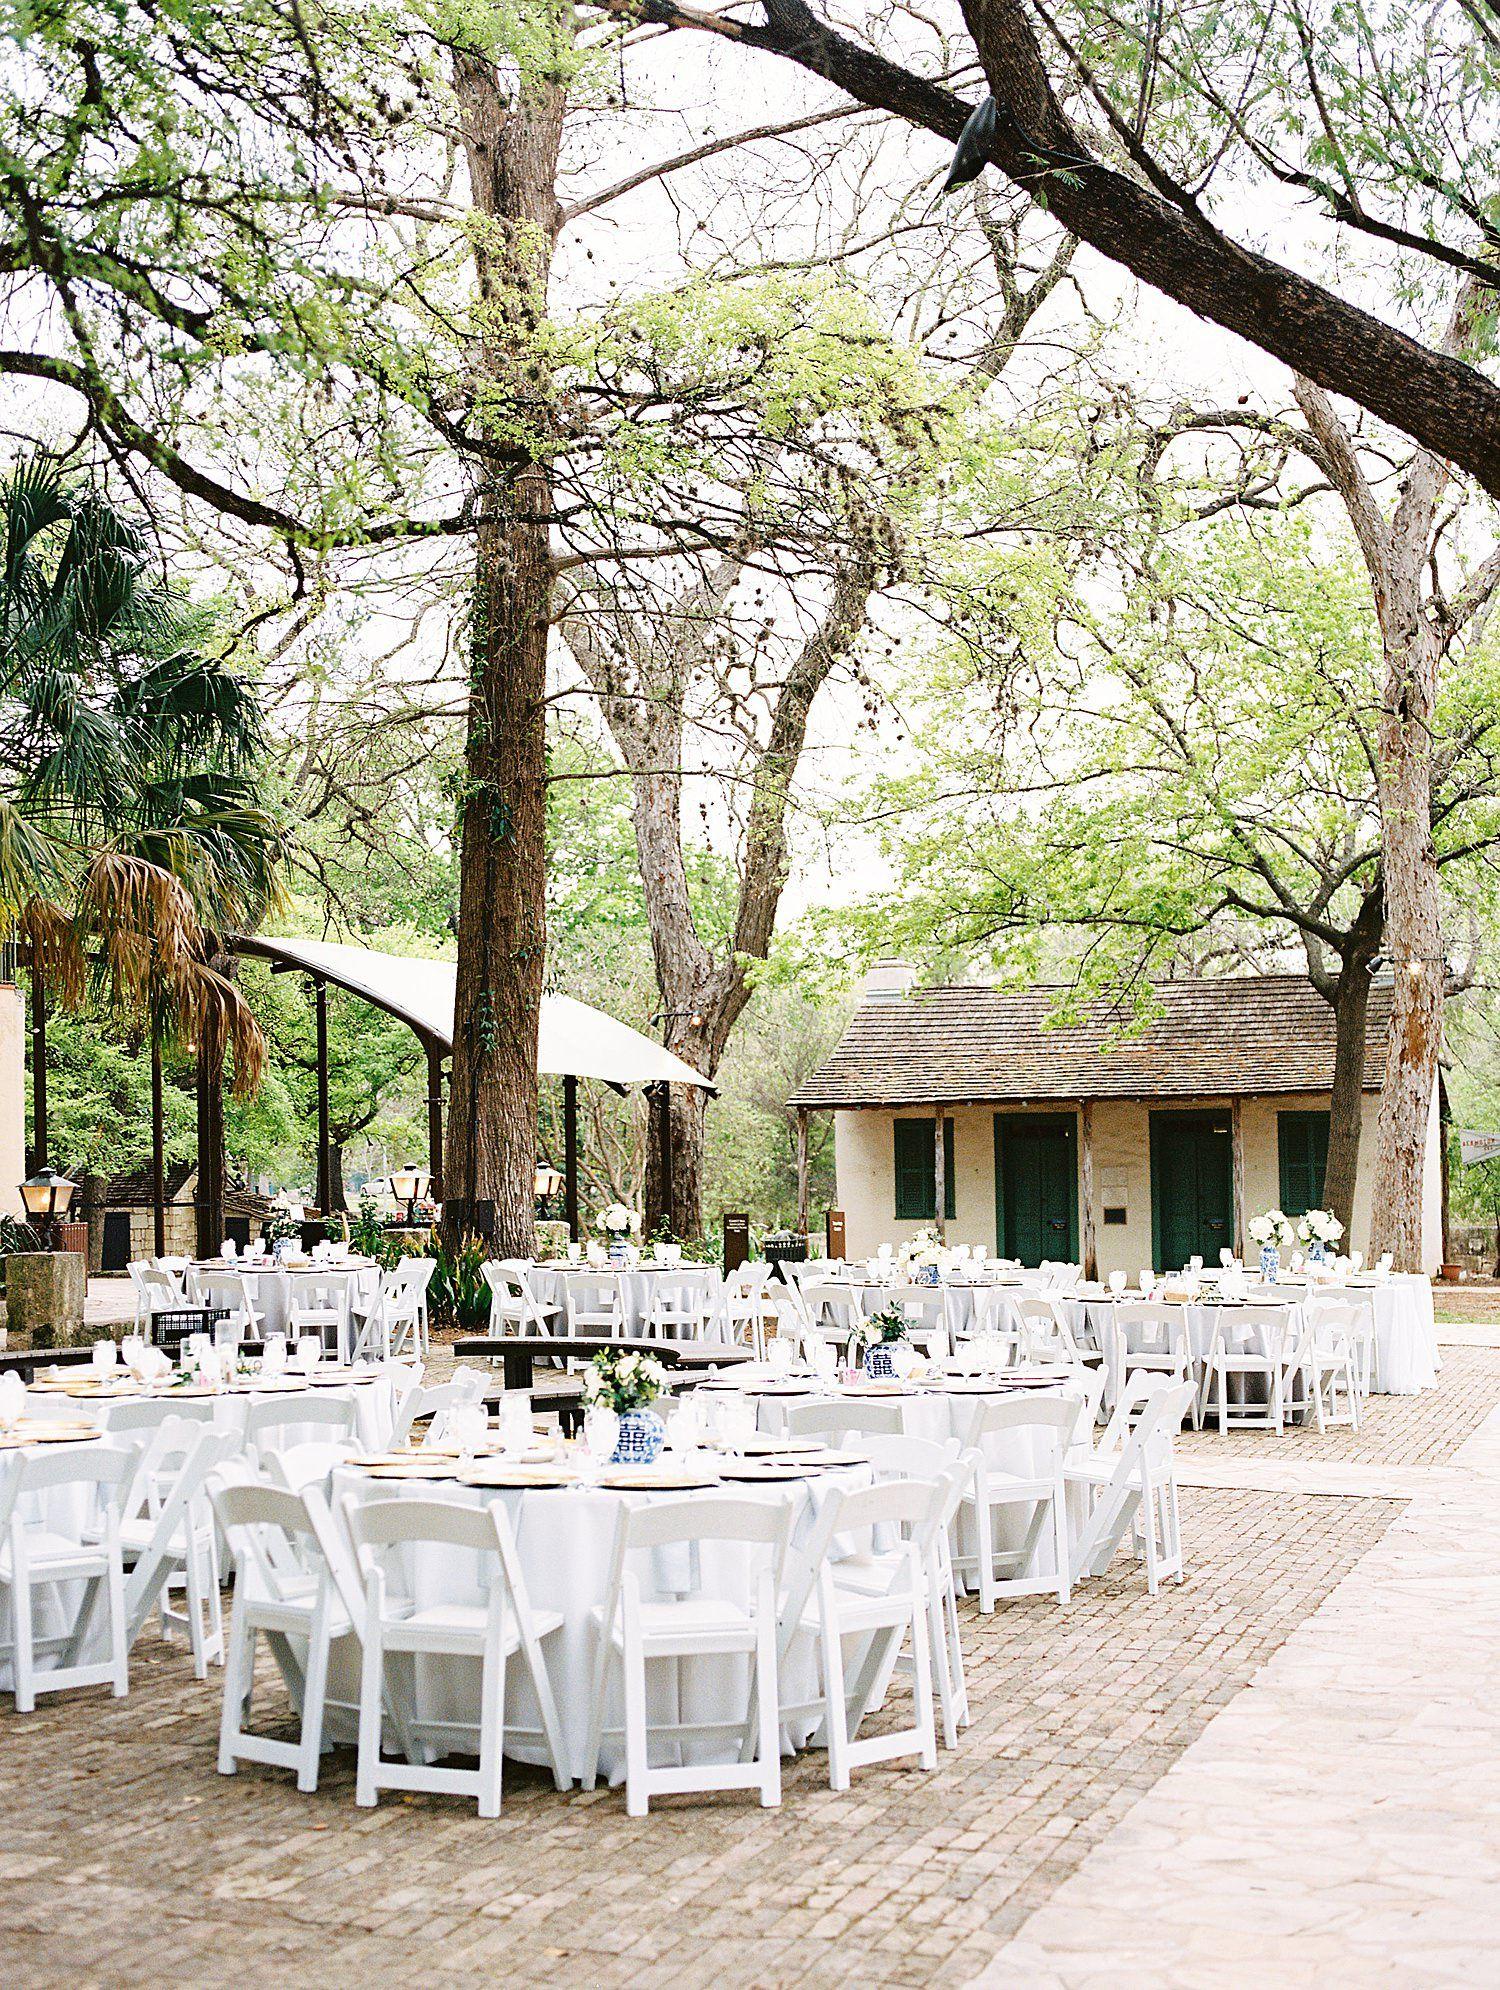 e23fadb0f65cbddea9fb283bfd02a84b - San Antonio Botanical Gardens Wedding Price